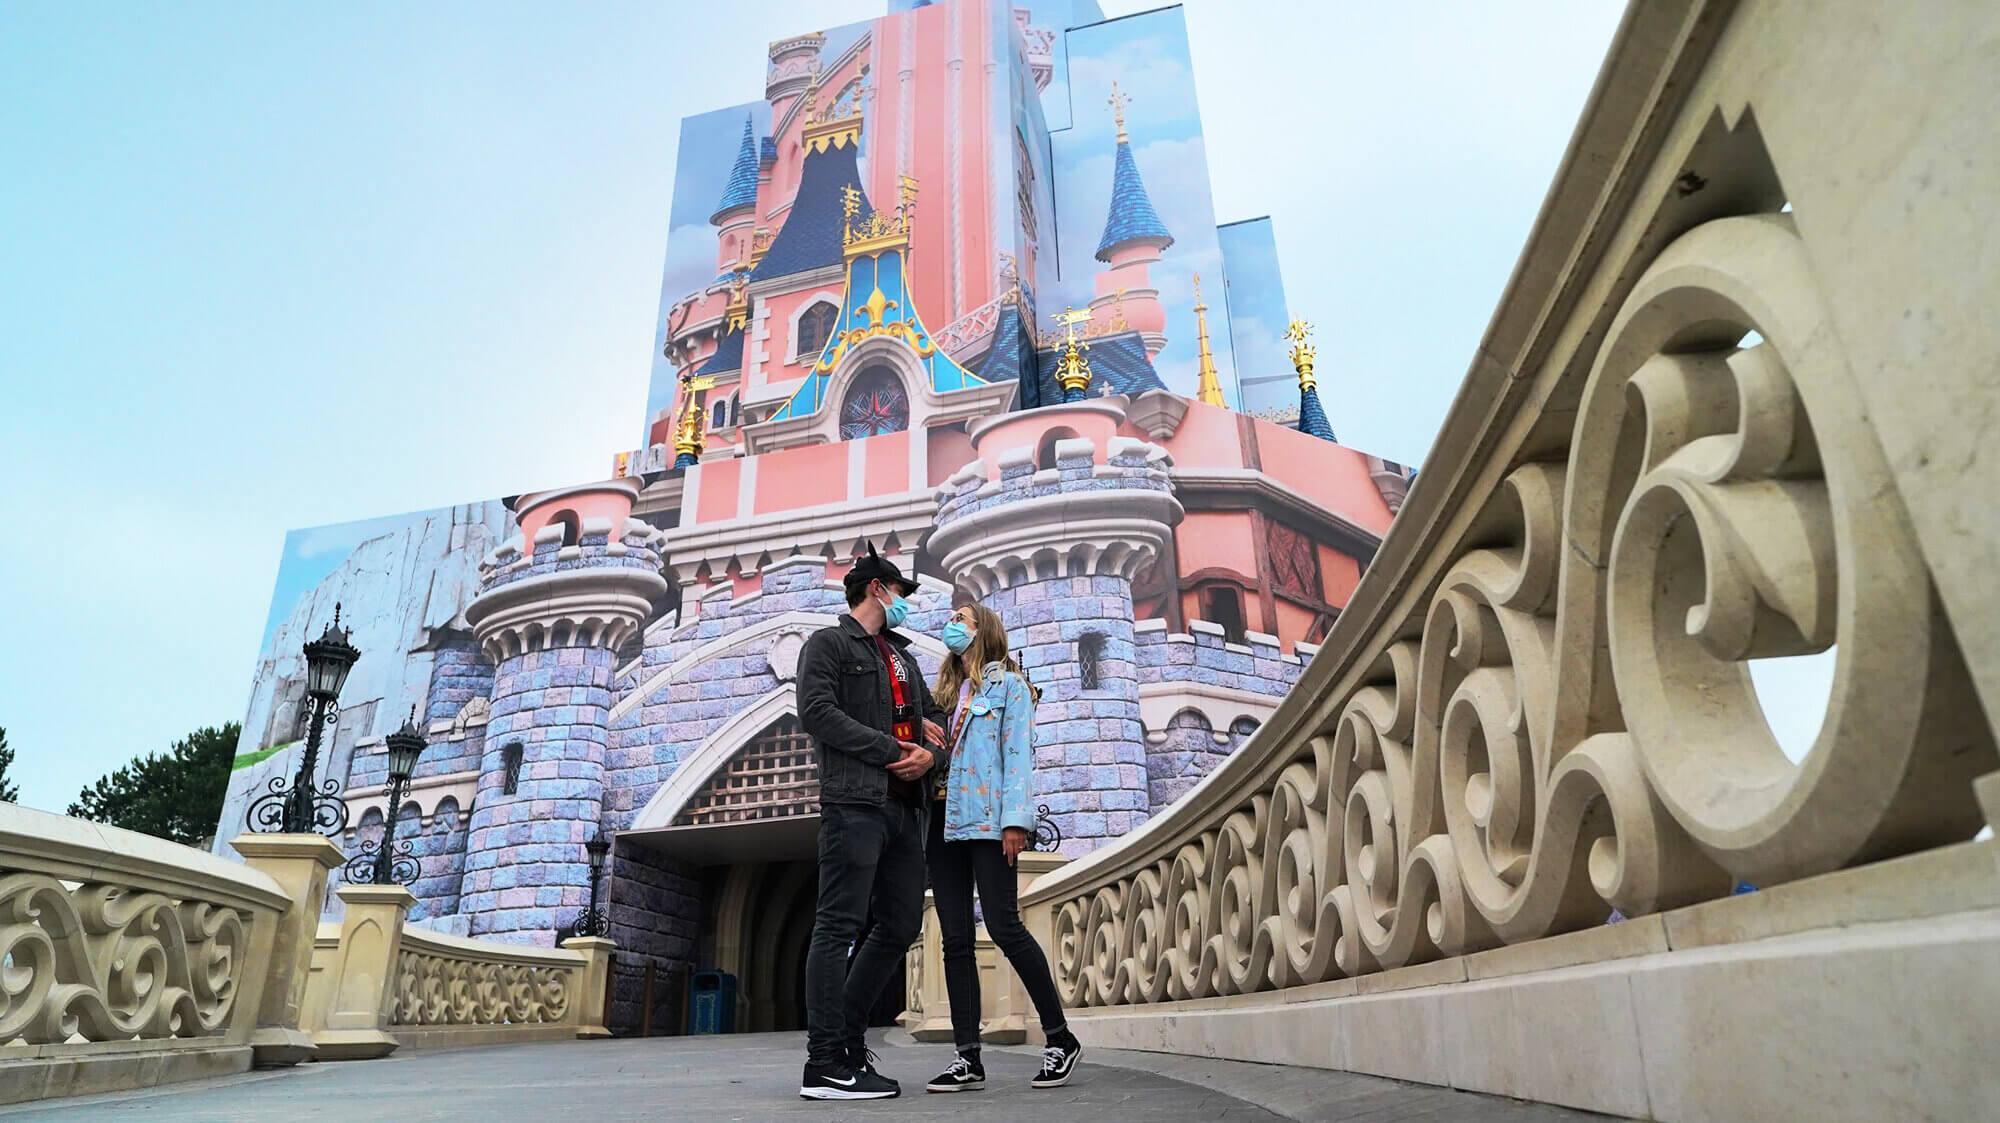 Yaz and Ash bring you the best gluten-free snacks at Disneyland Paris!